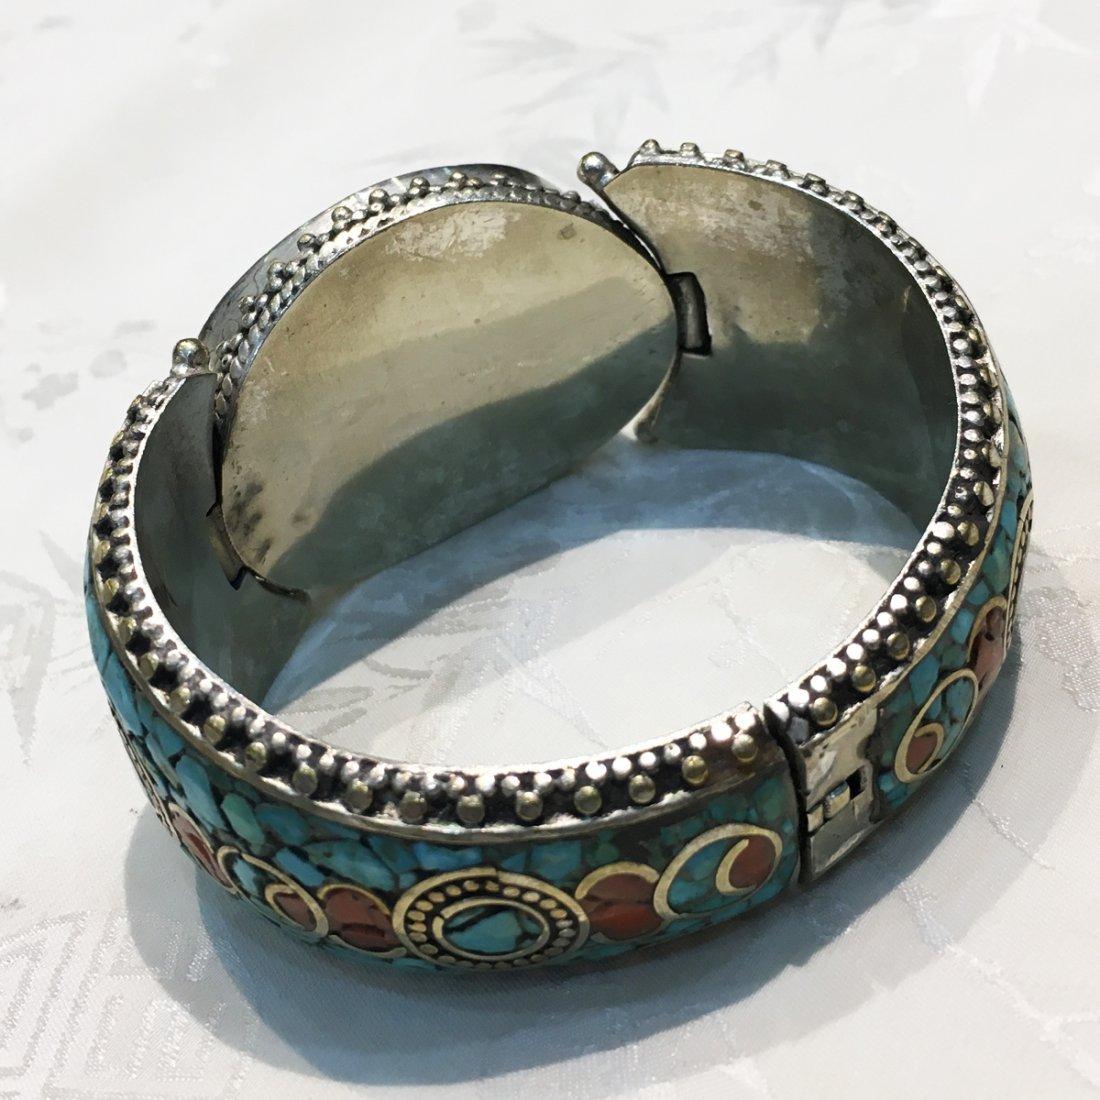 Traditional Tibetan Turquoise with Coral Bangle - 3